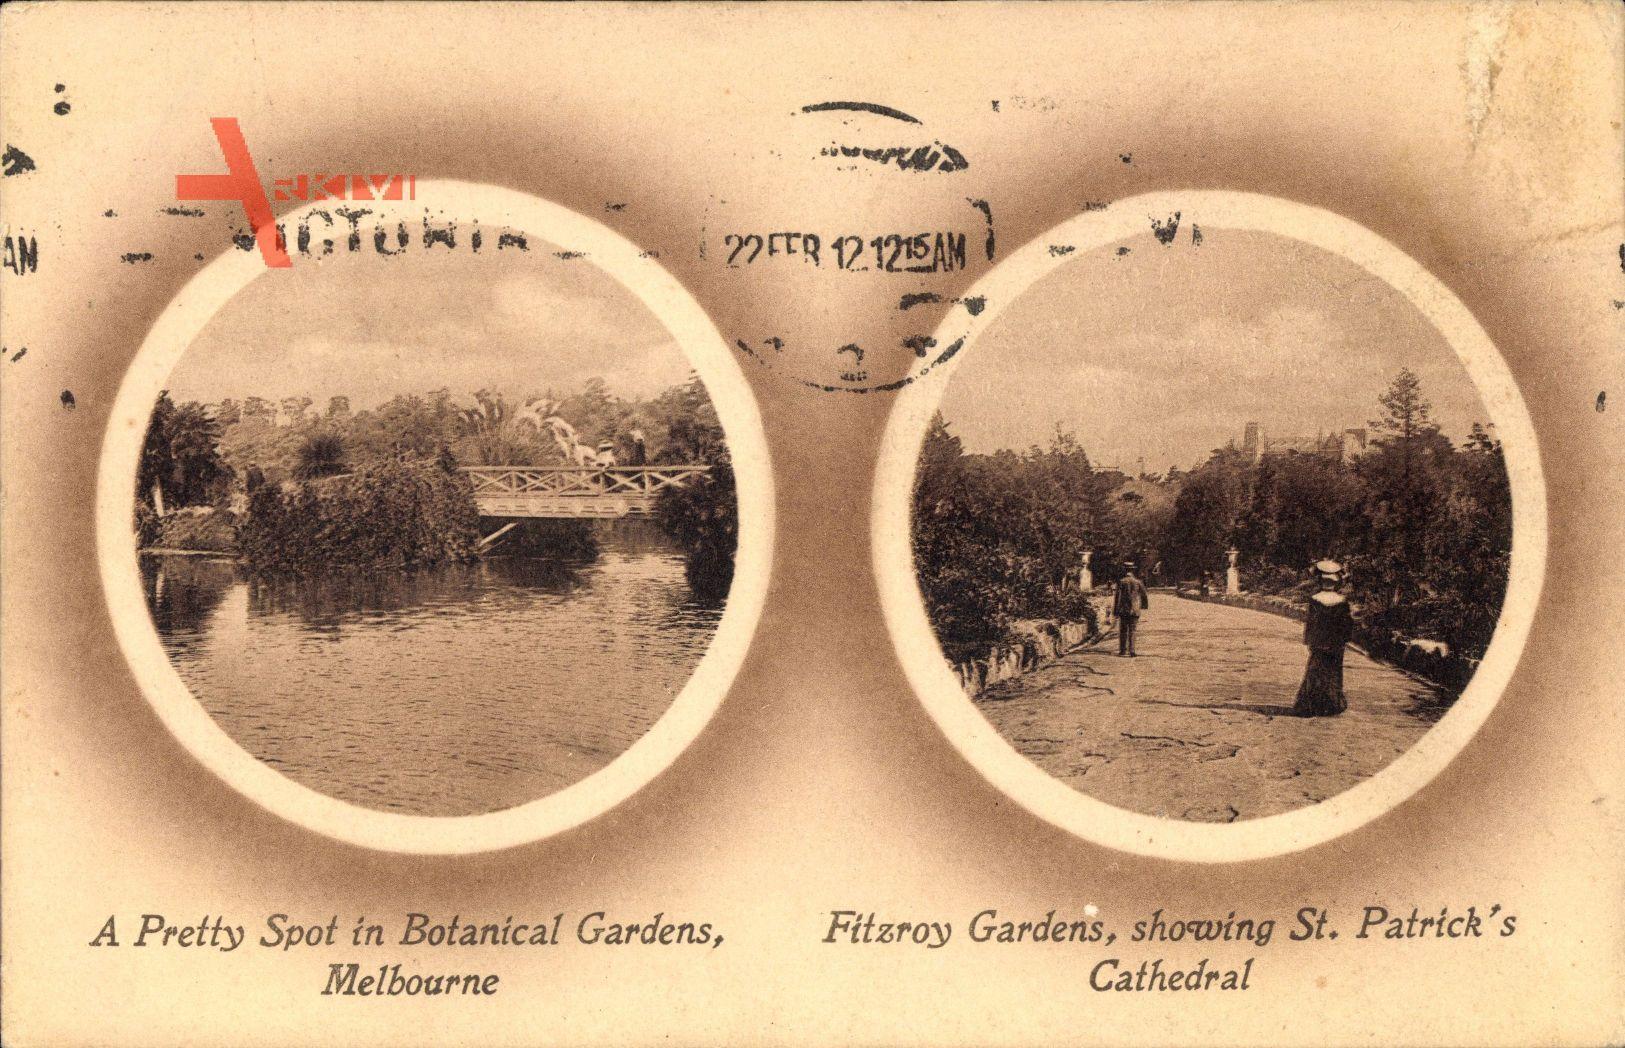 Passepartout Melbourne Australien, Botanical Gardens, St. Patrick's Cathedral